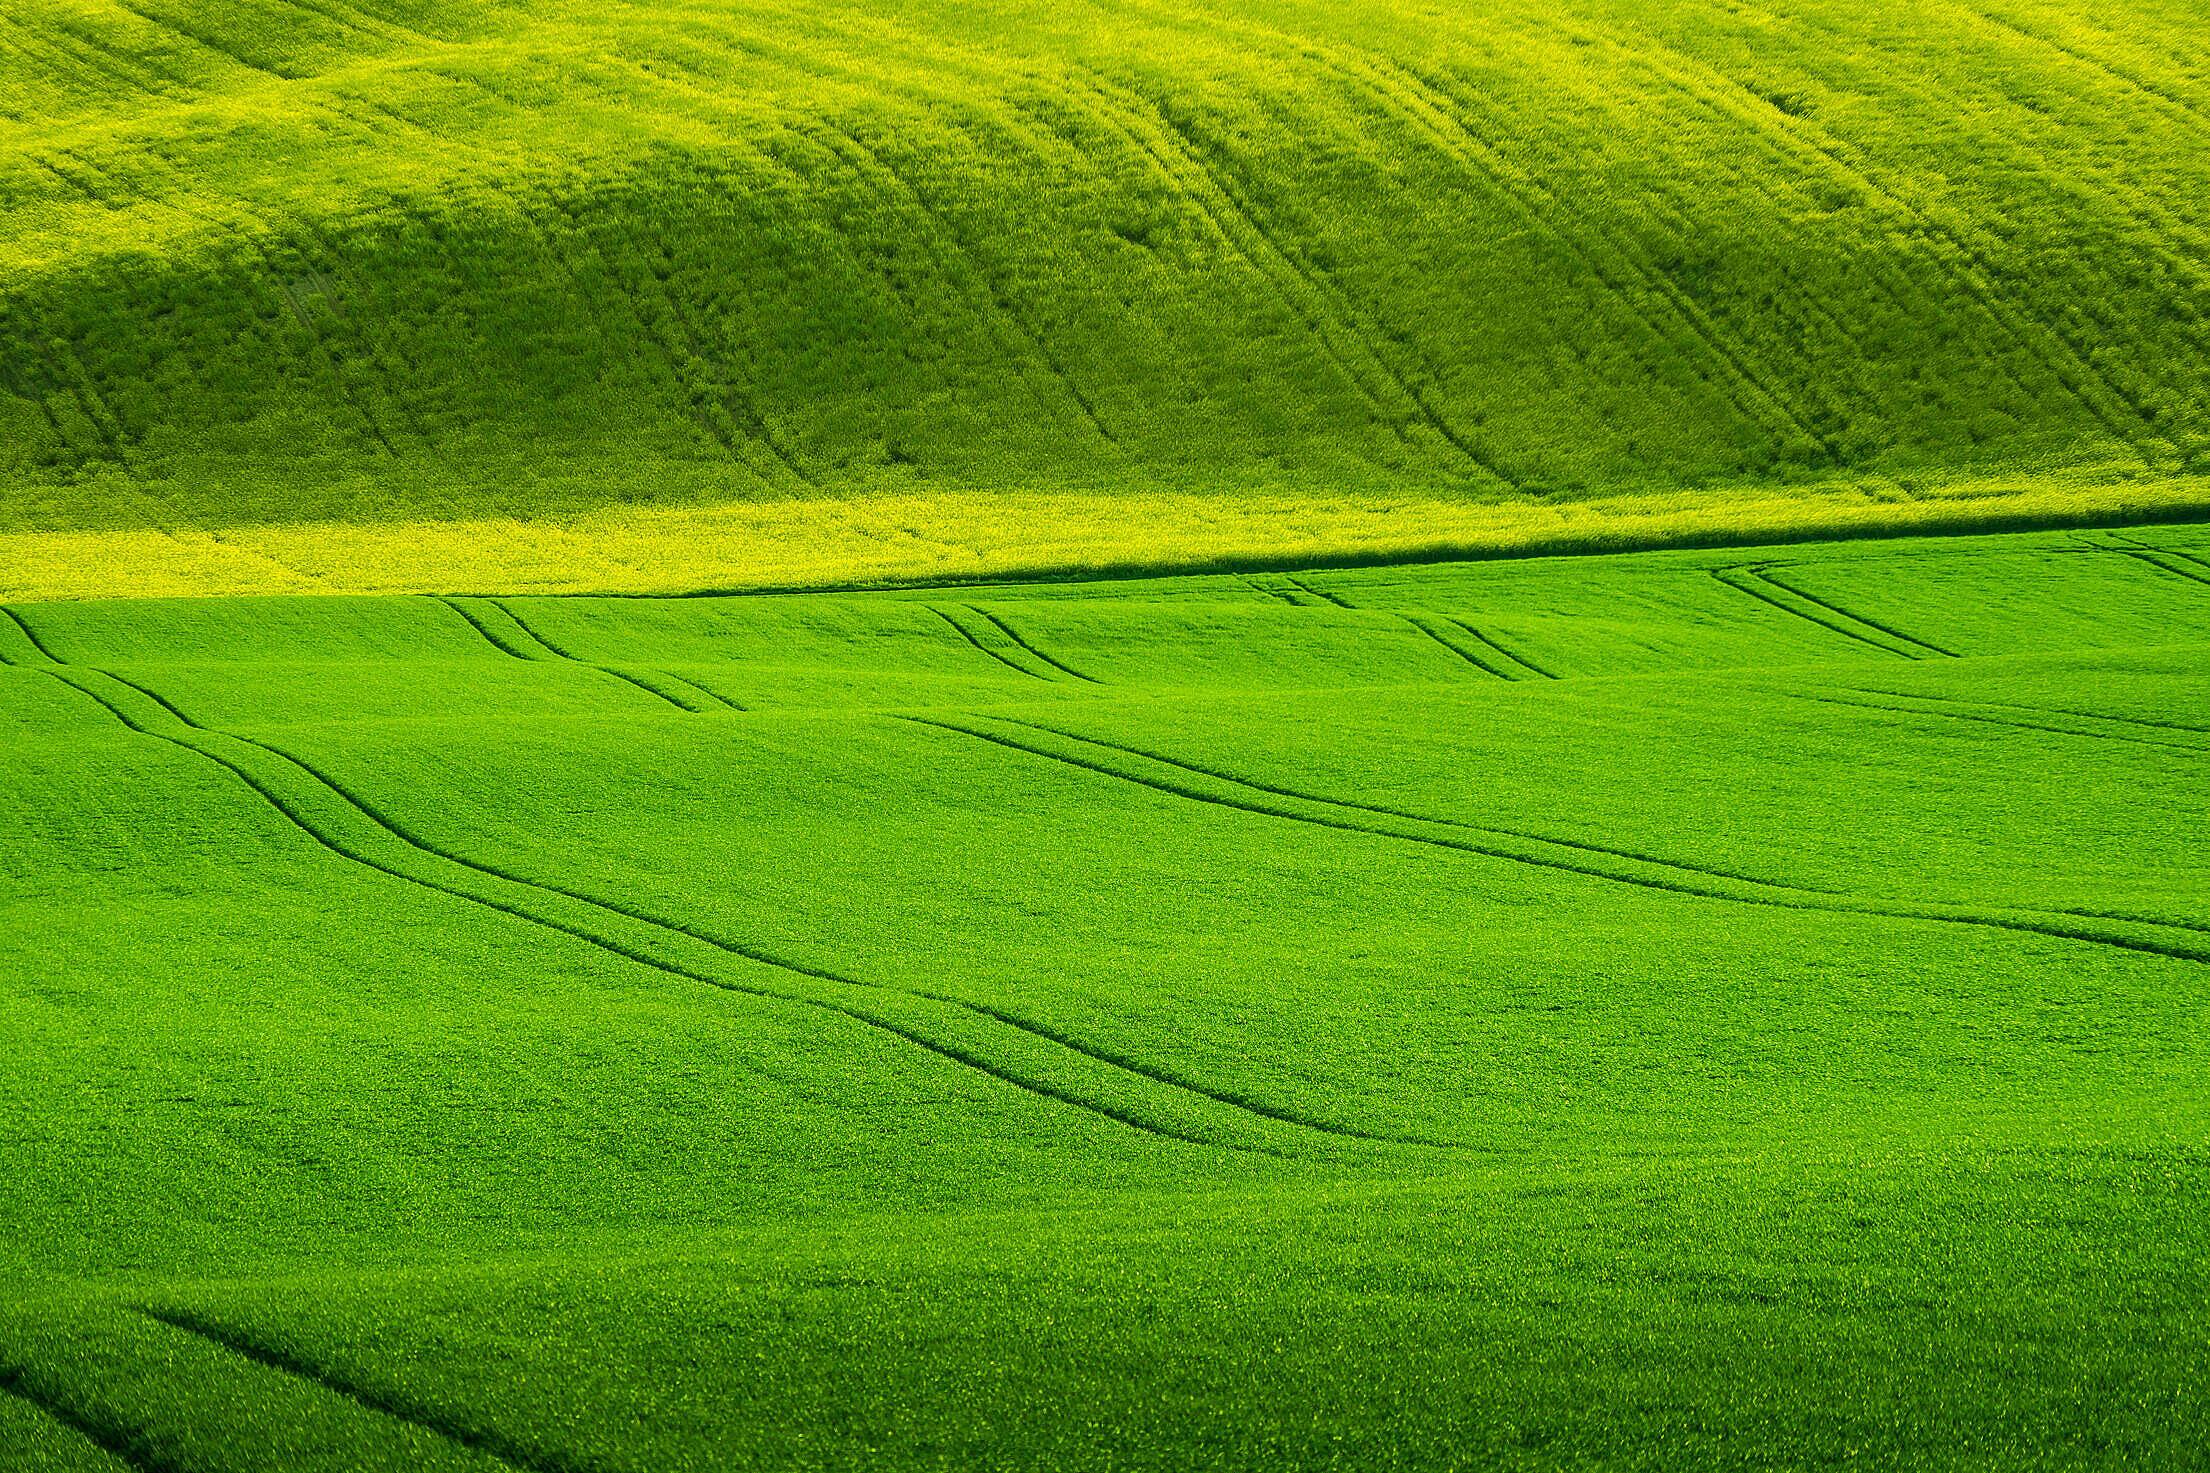 Wavy Green Wheat Fields Free Stock Photo